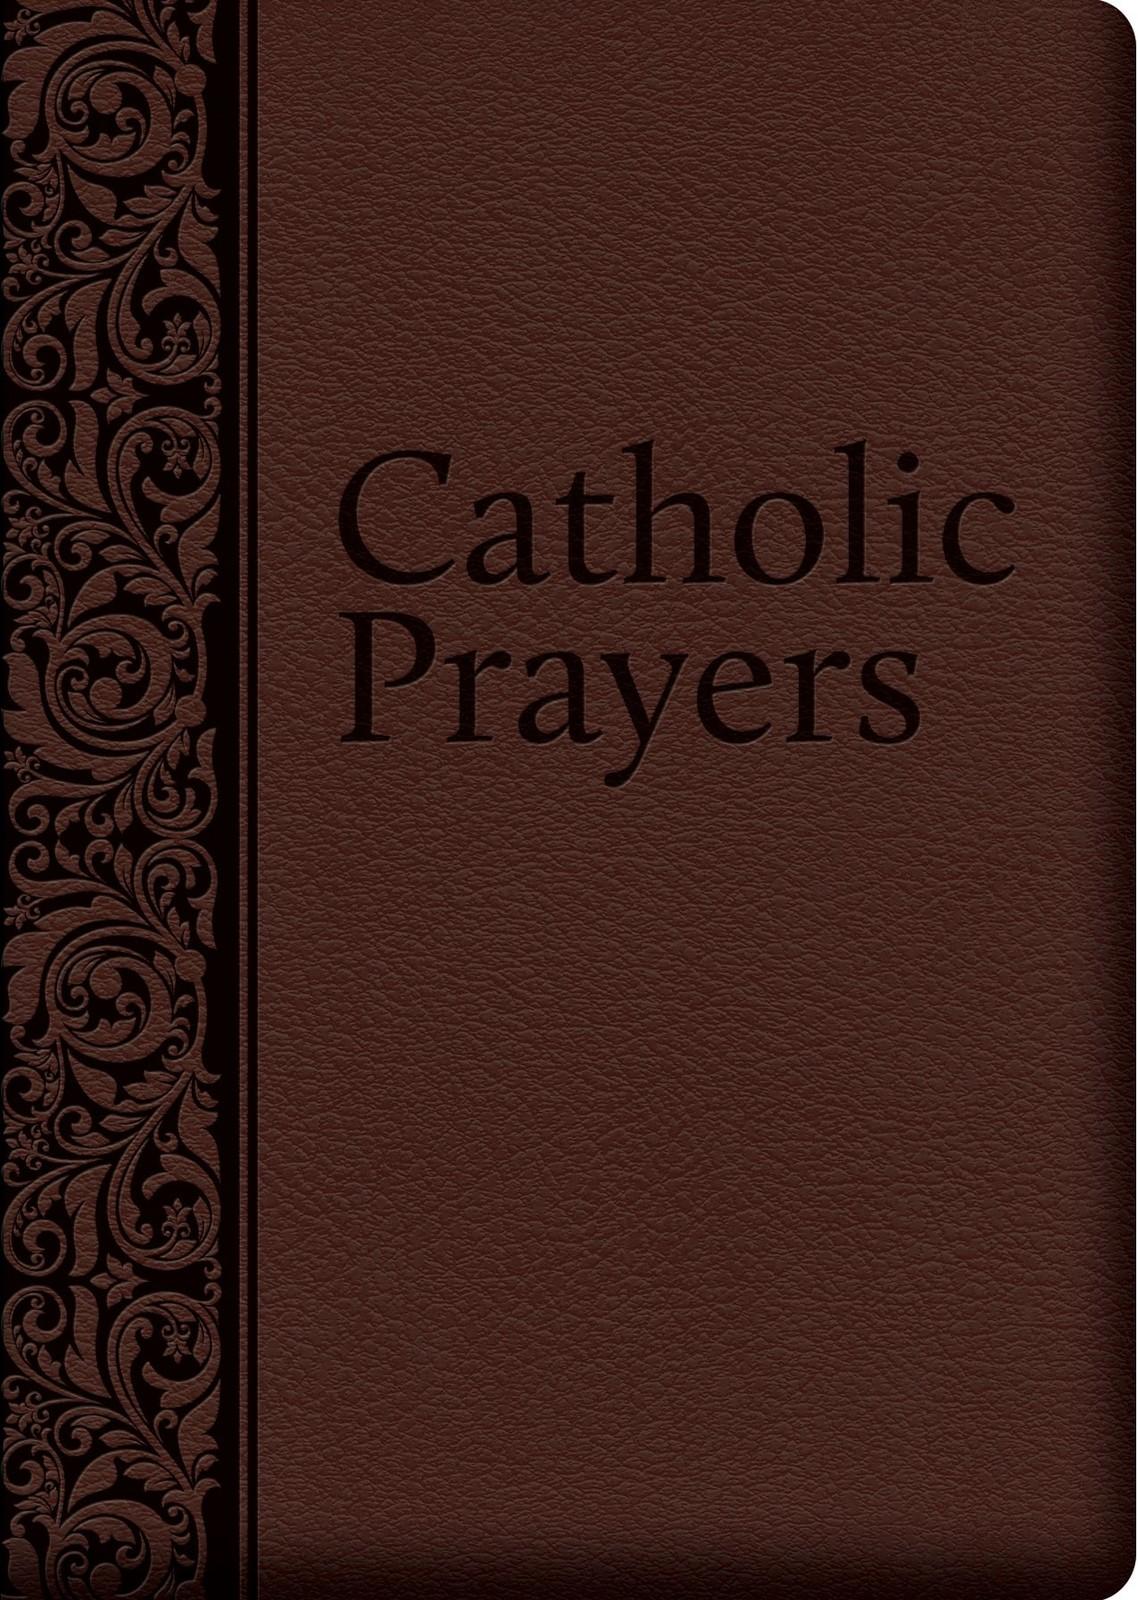 Catholic prayers  ultrasoft